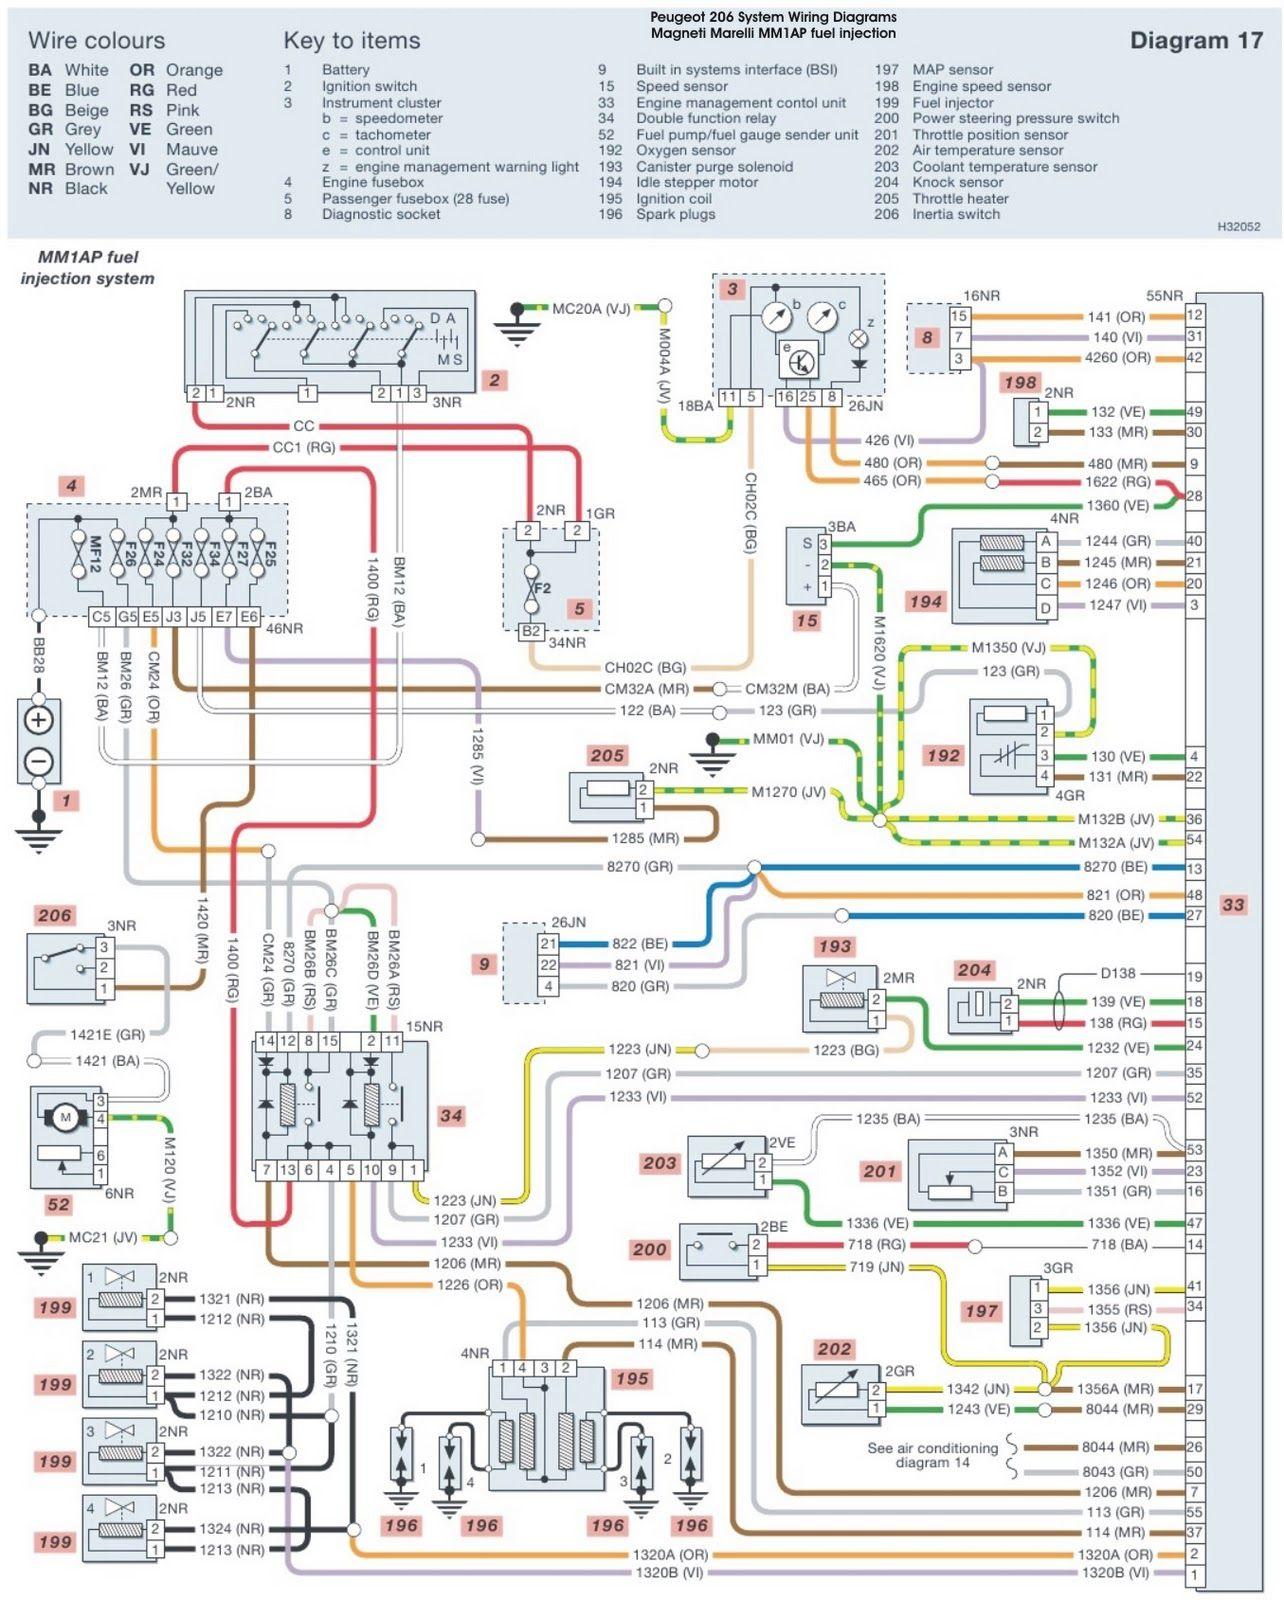 Peugeot Wiring Diagram 206 Wiring Diagrams All Peugeot Electrical Diagram Trailer Light Wiring